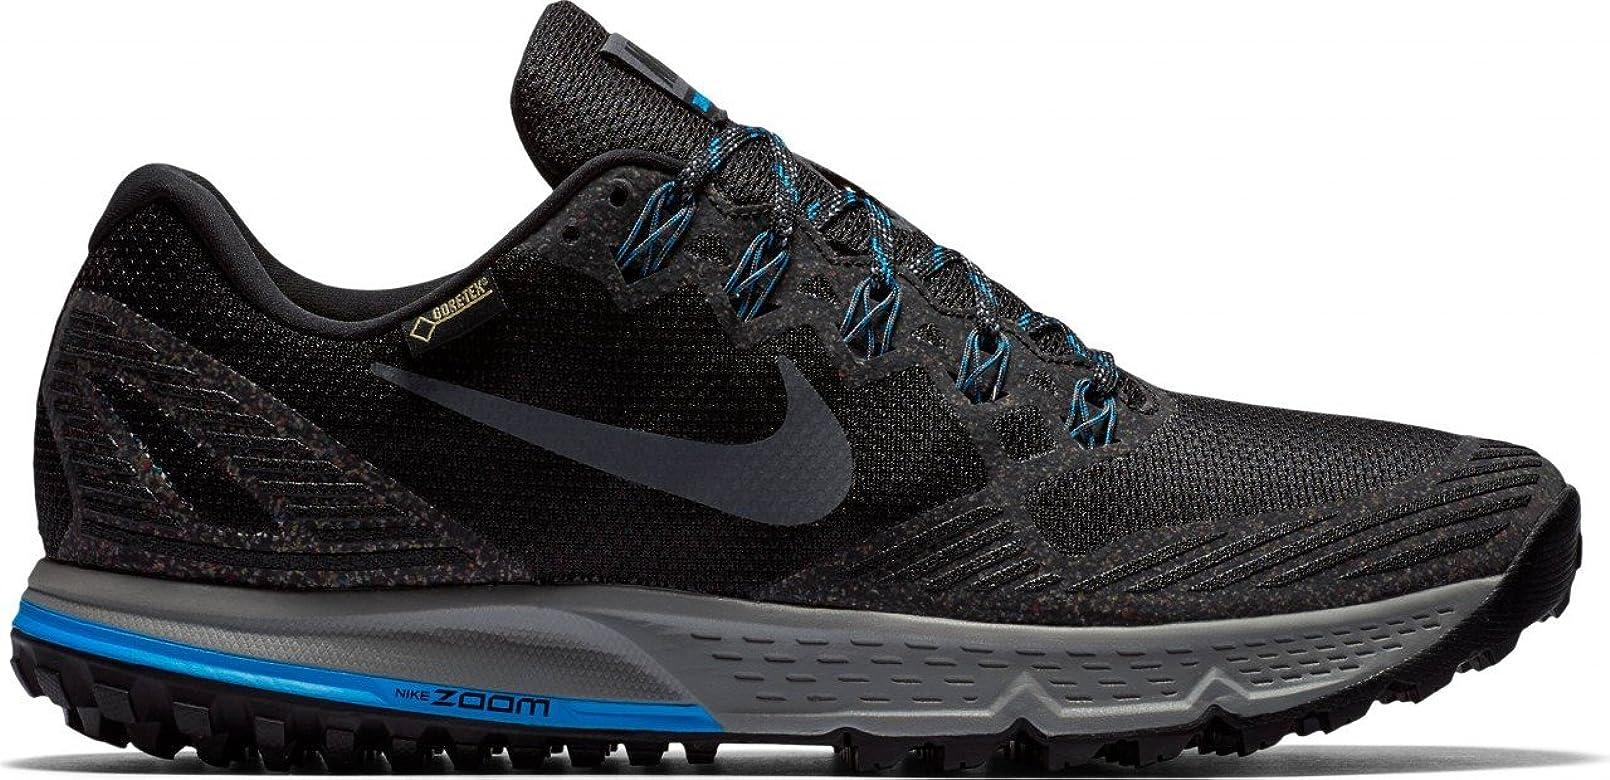 Nike Air Zoom Wildhorse 3 GTX Herren